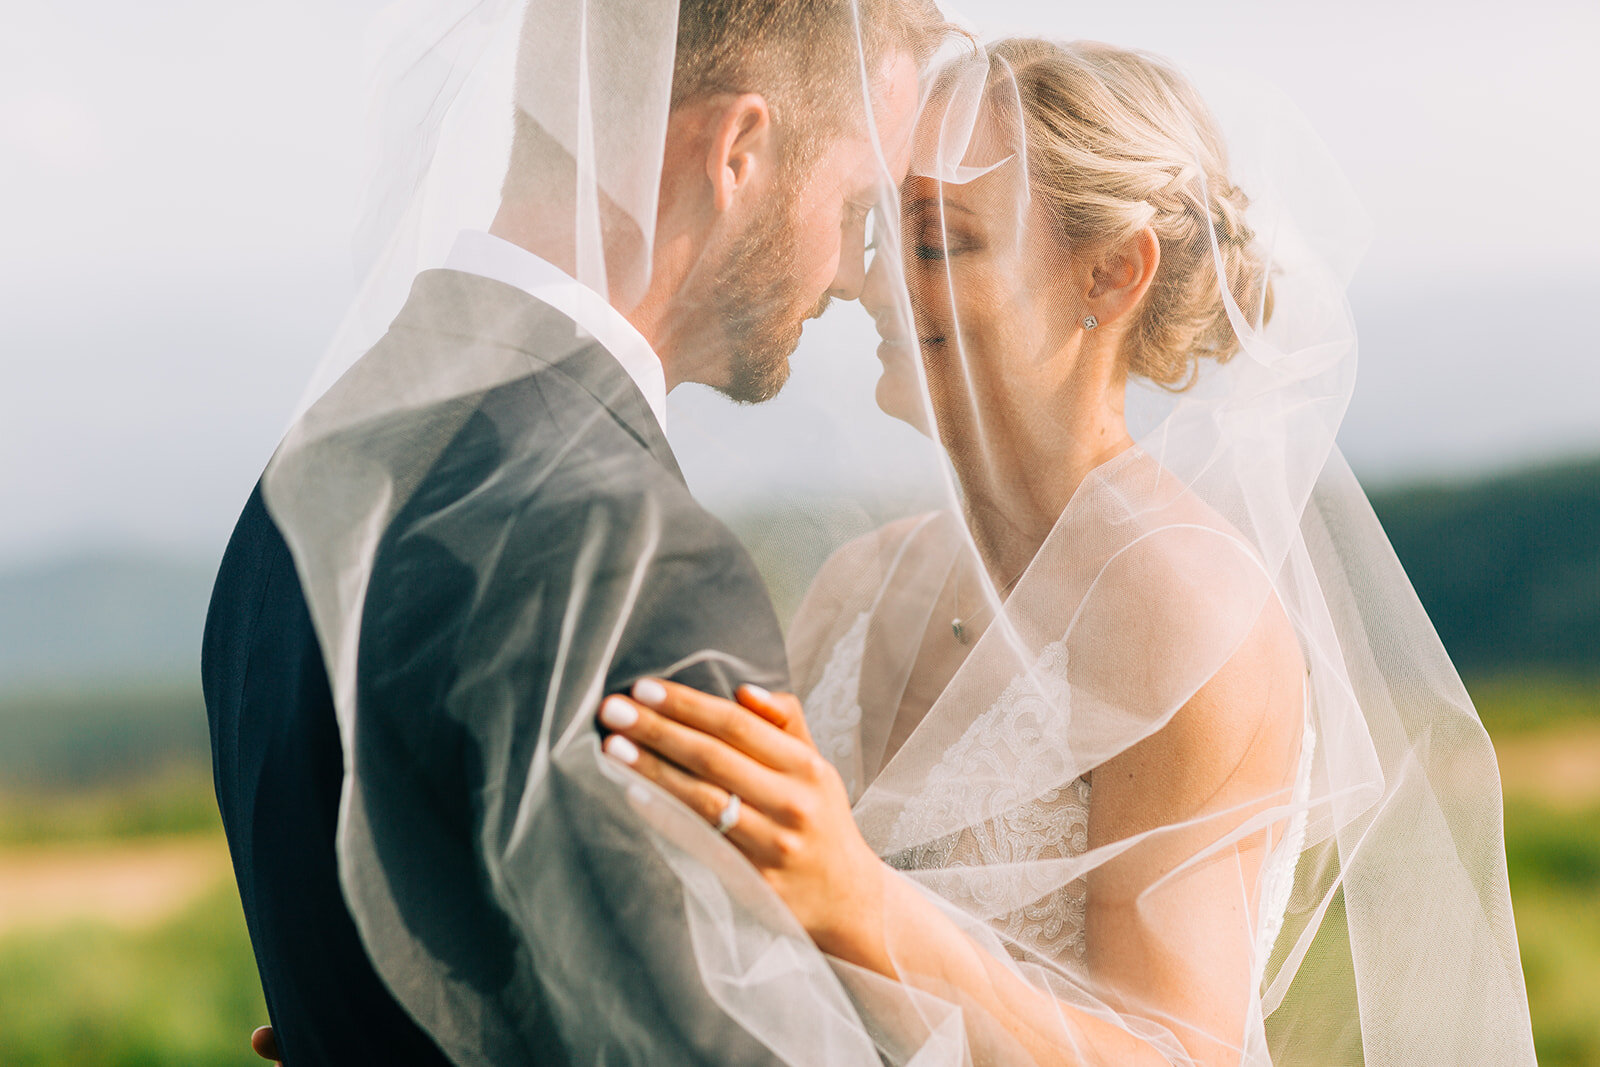 bride ring spokane wedding